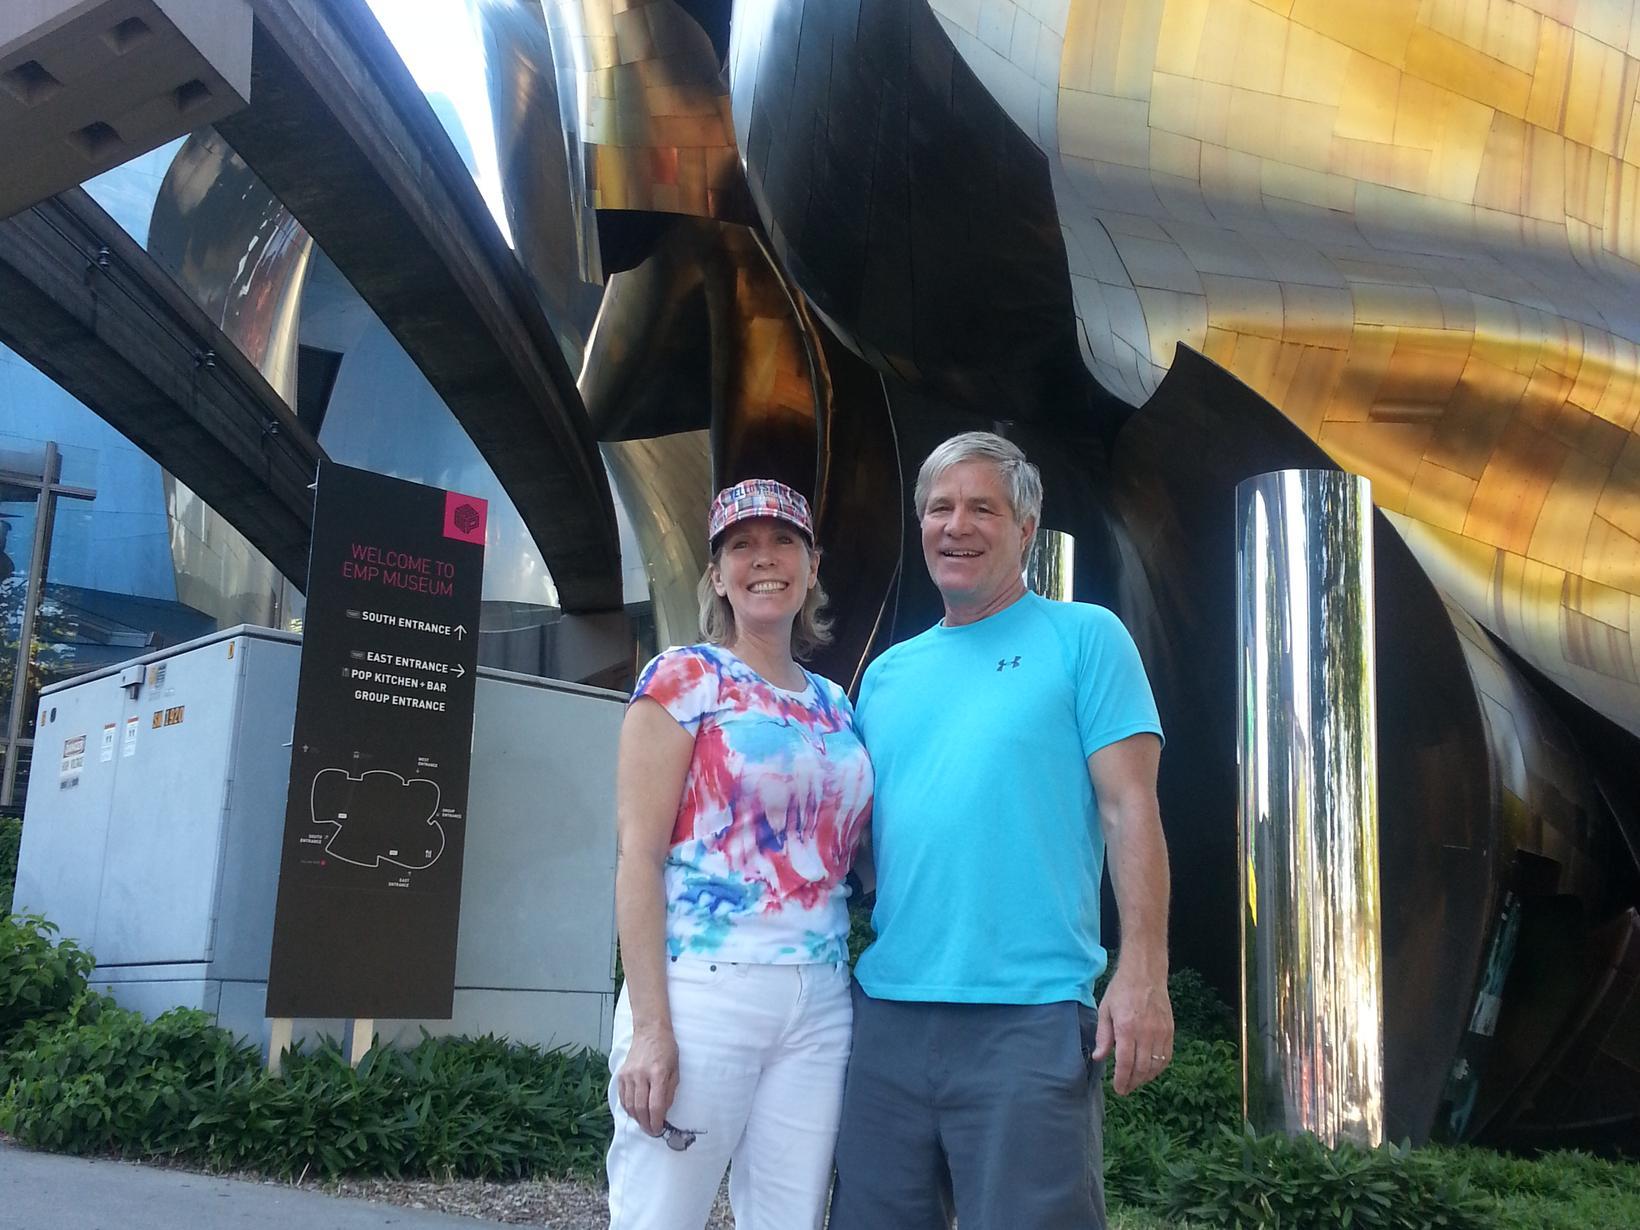 Molly & Tim from Seattle, Washington, United States